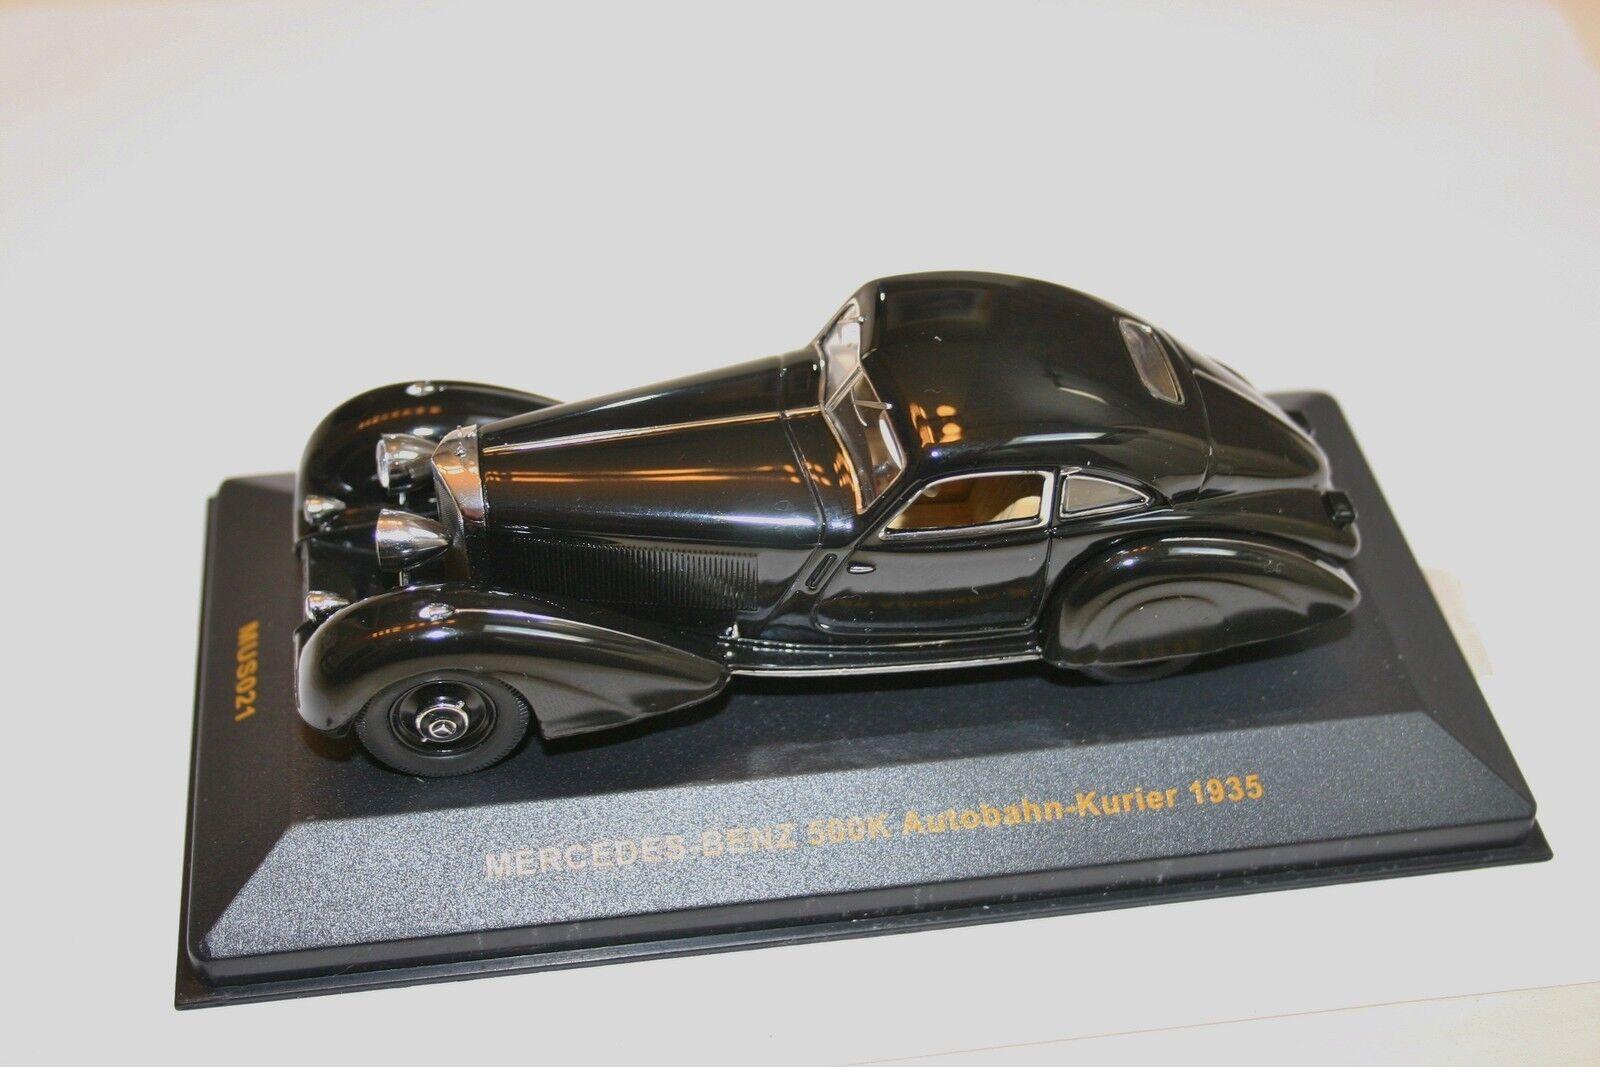 1/43 Mercedes Benz 500k autobahn-kurier 2018 Negro Coupe Raro Ixo Museum Sin Caja